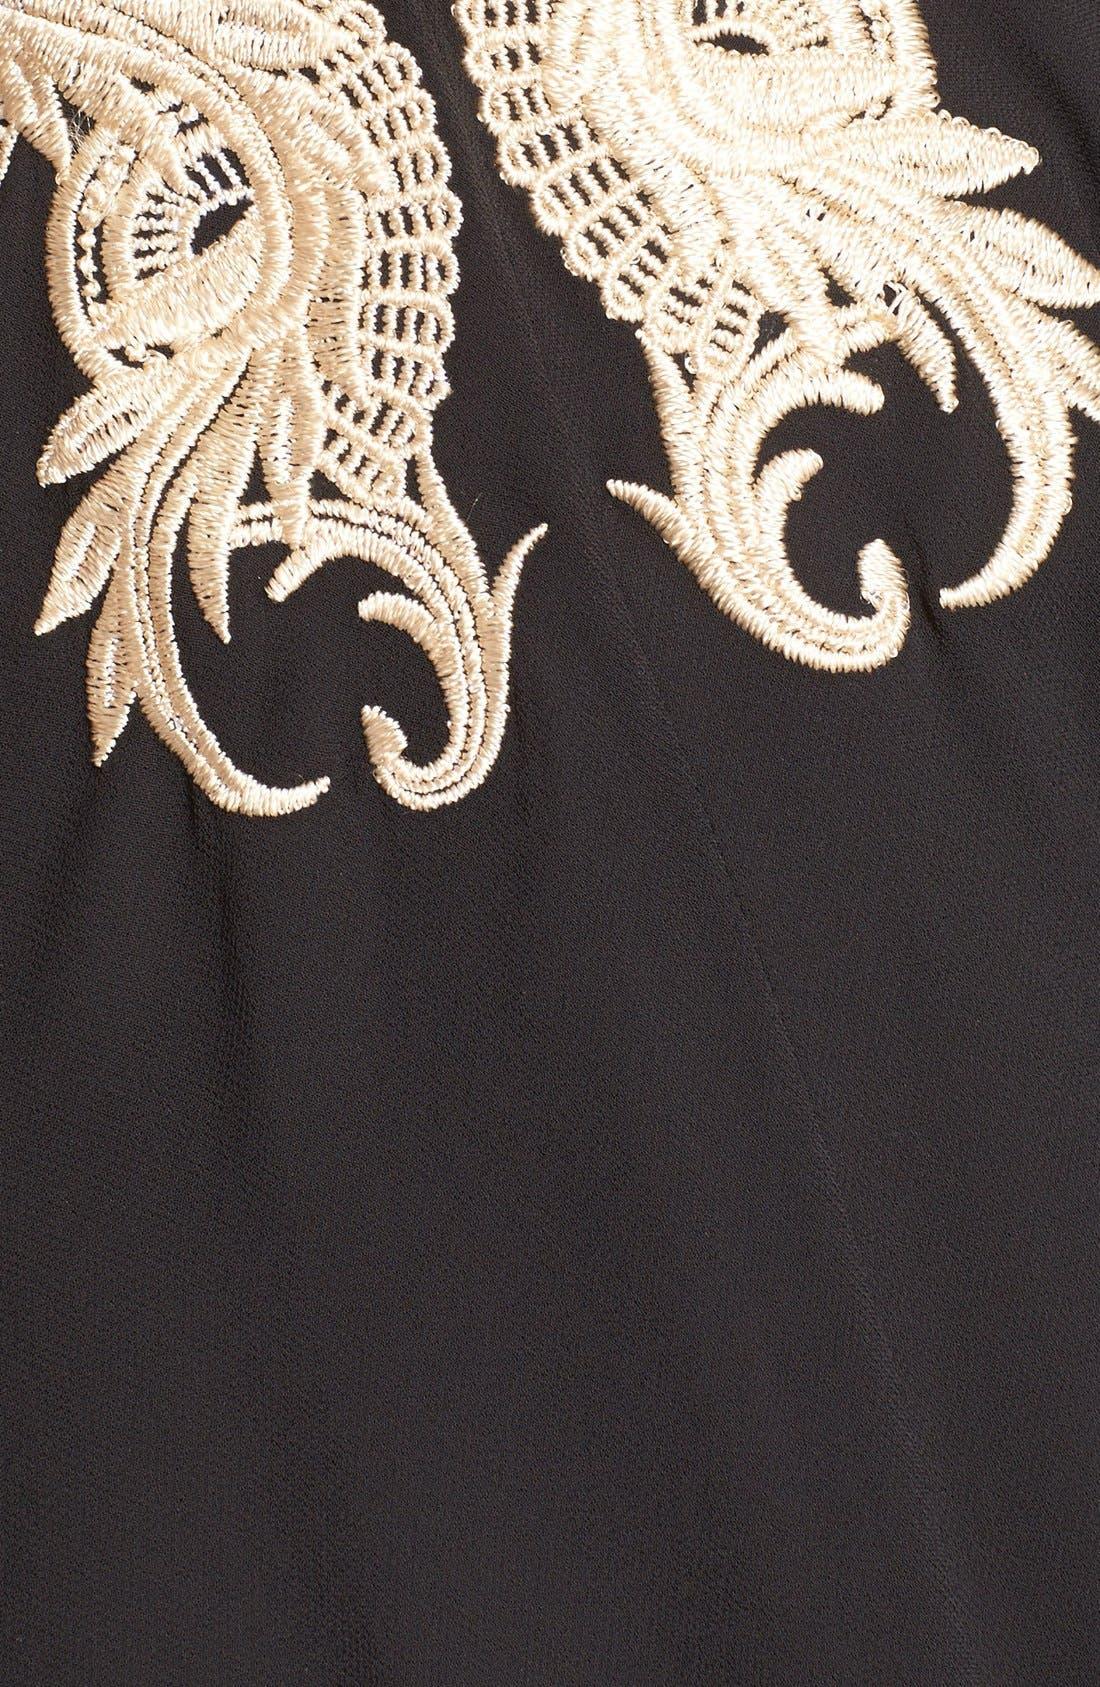 Alternate Image 3  - Ted Baker London 'Gaenor' Embroidered Fit & Flare Dress